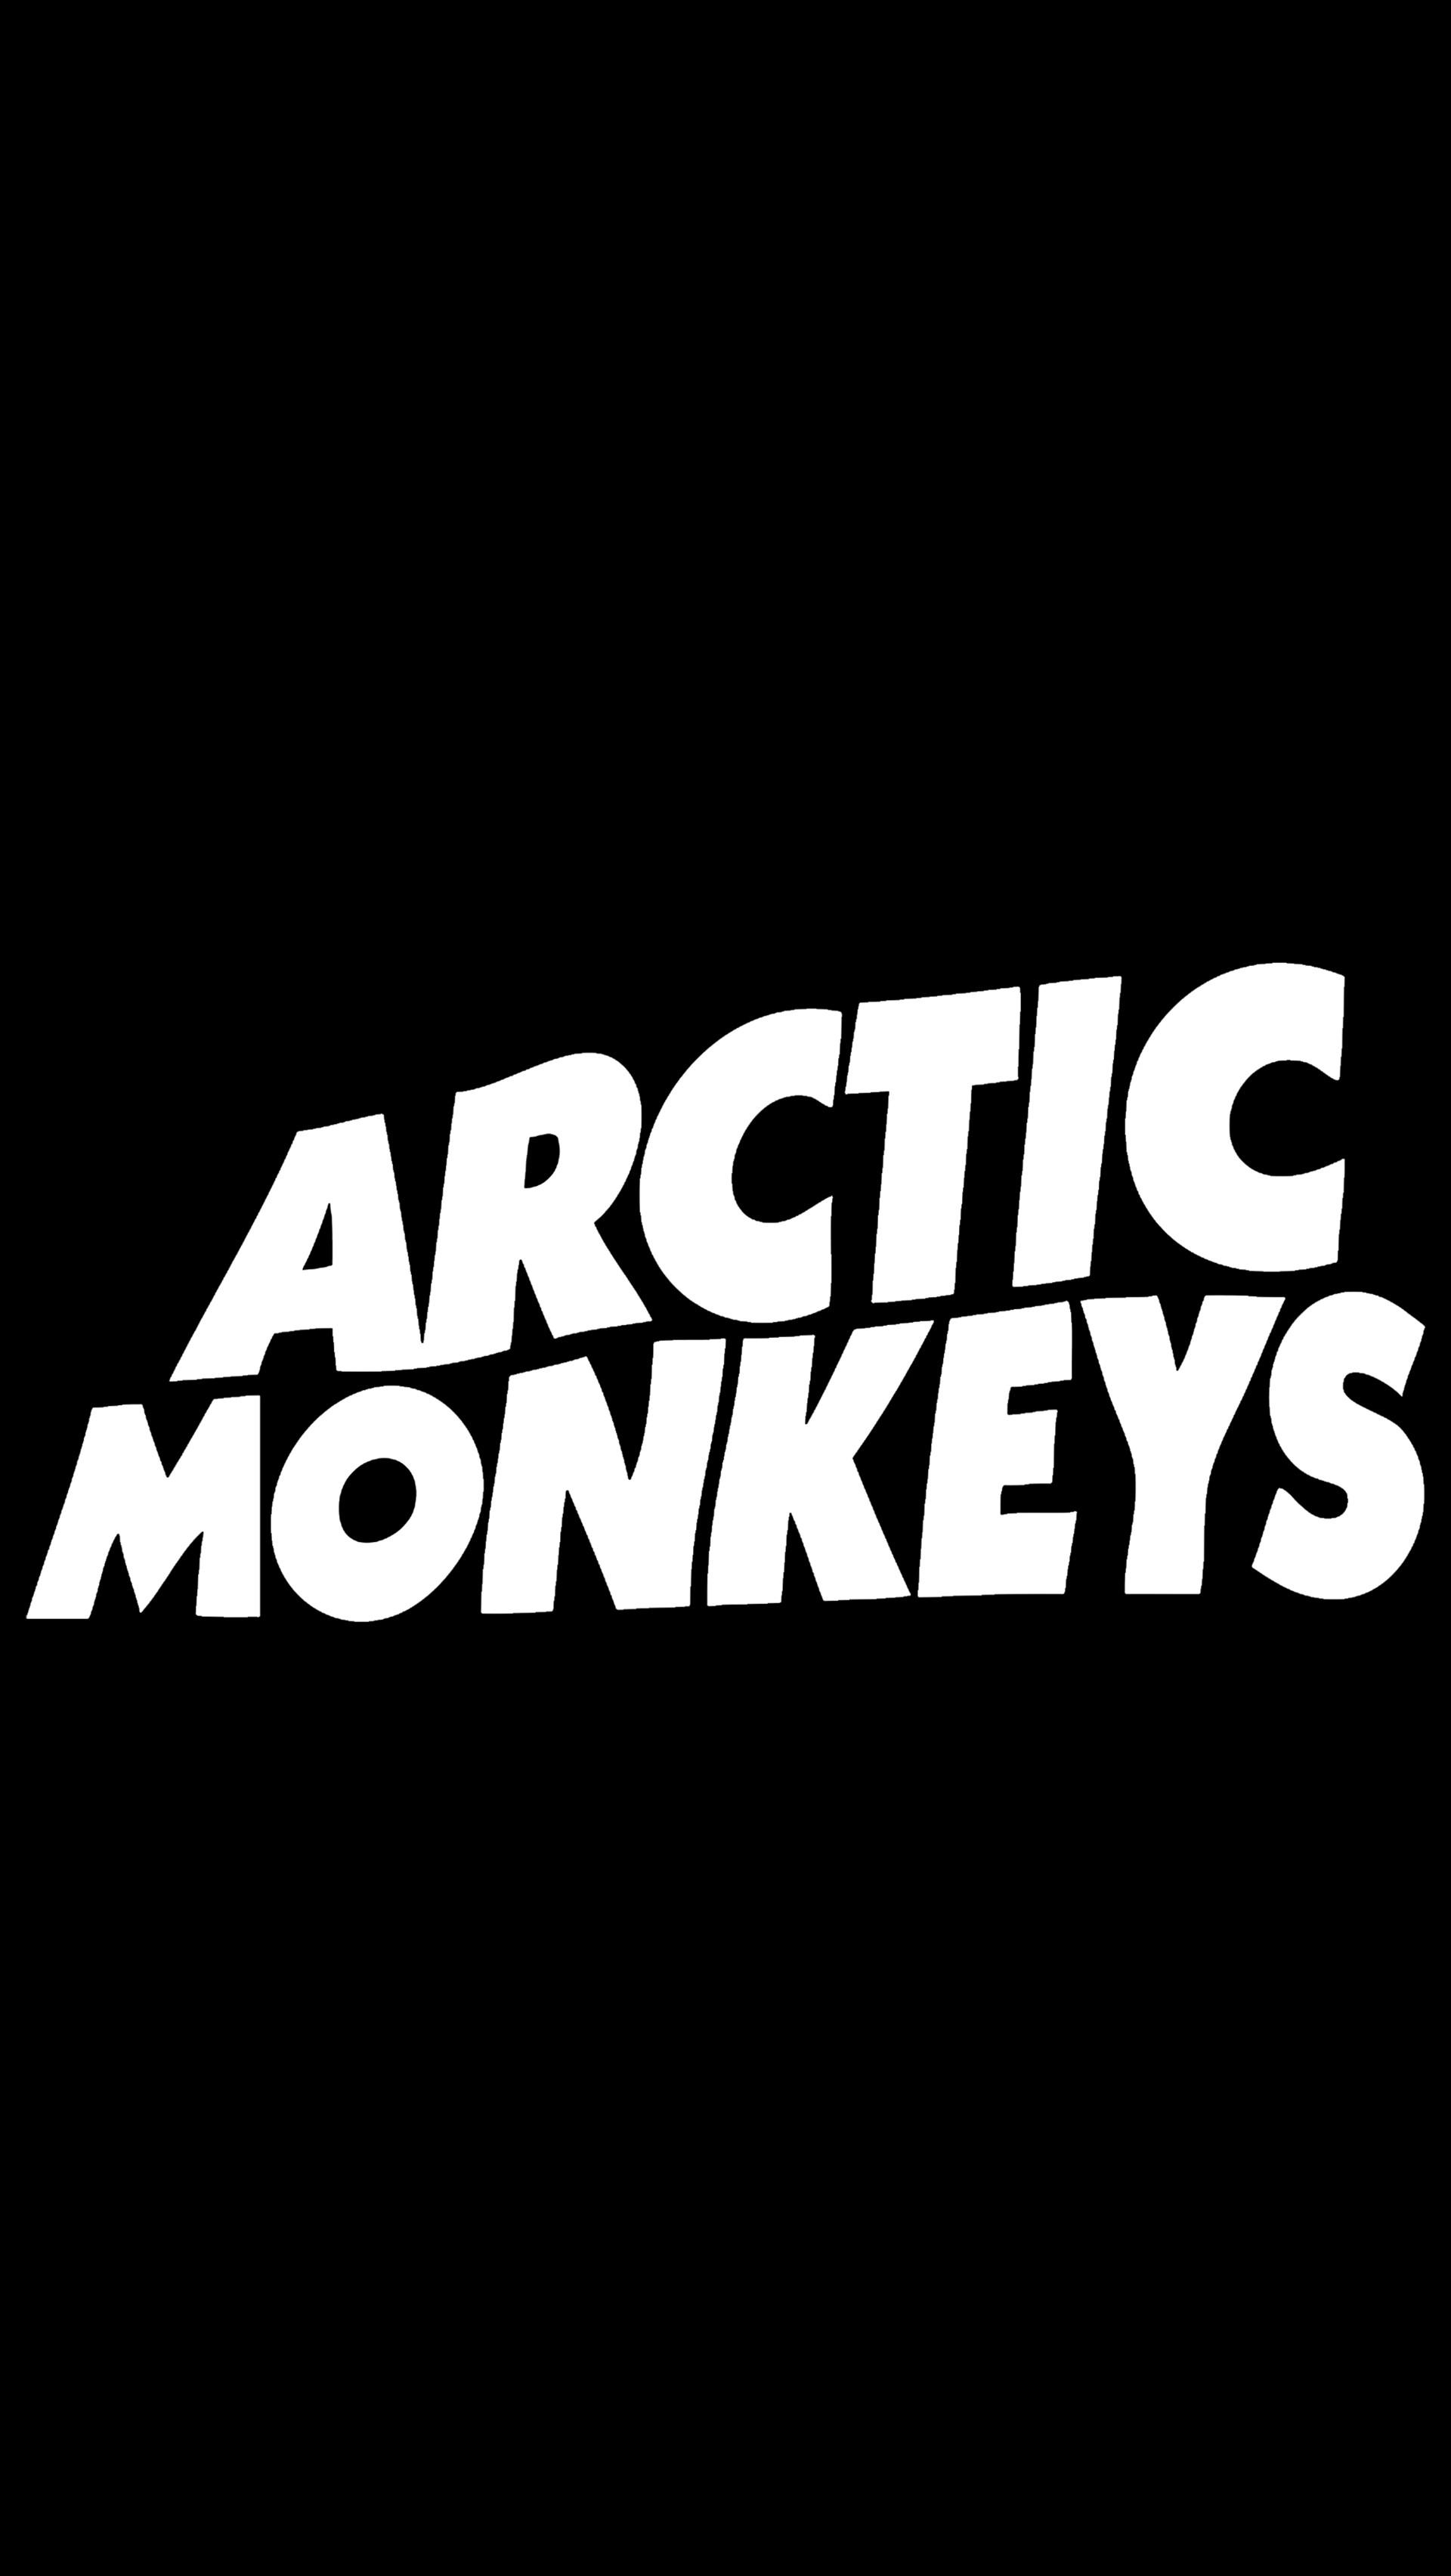 1920x3408 Arctic Monkeys Iphone Wallpaper Arcticmonkeys Iphone5 White